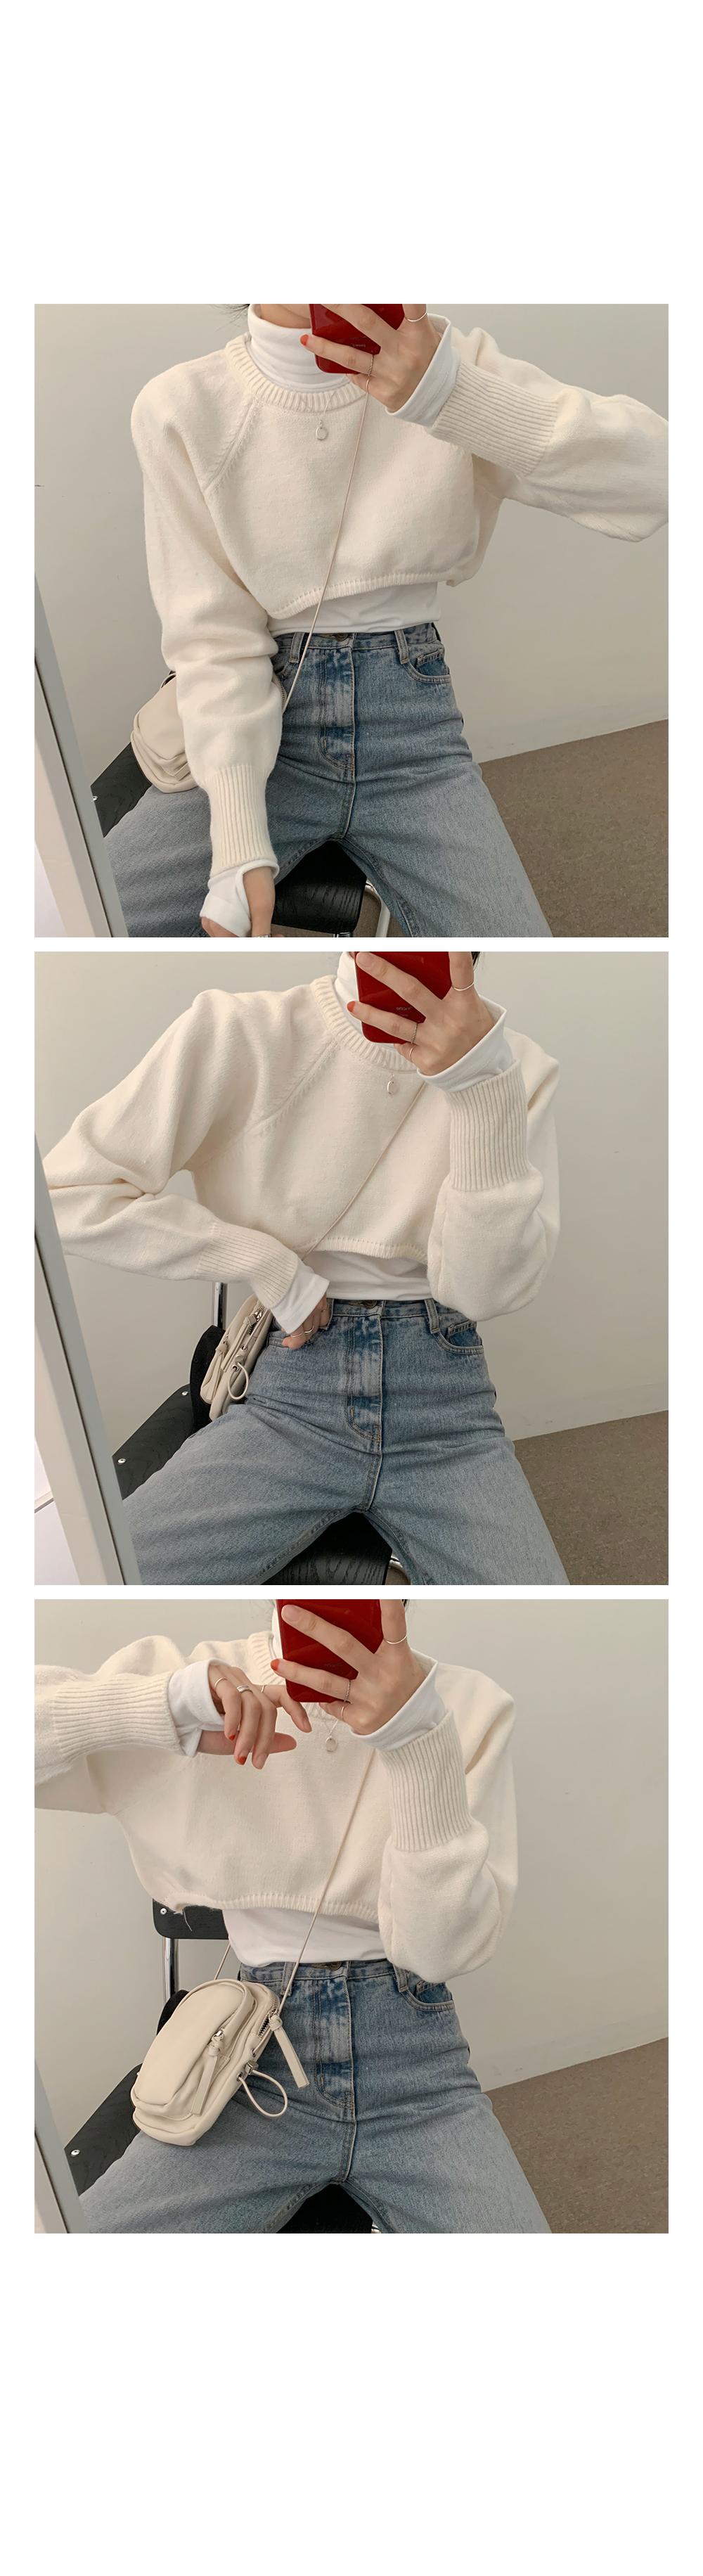 Rose Crop Top Knit